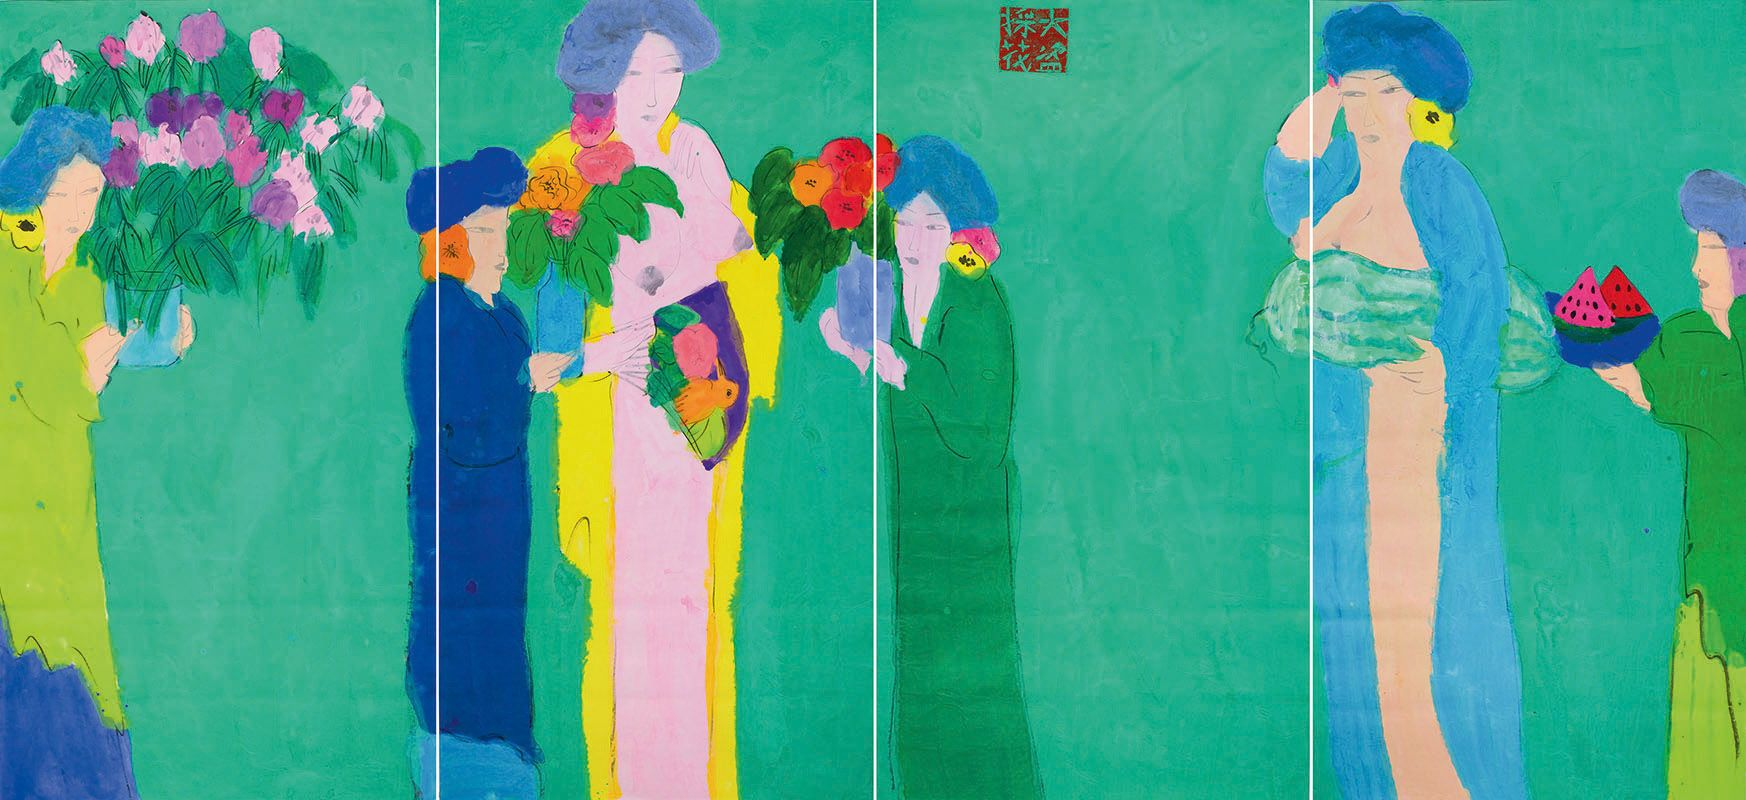 Top 5 Art Exhibitions In Hong Kong This May